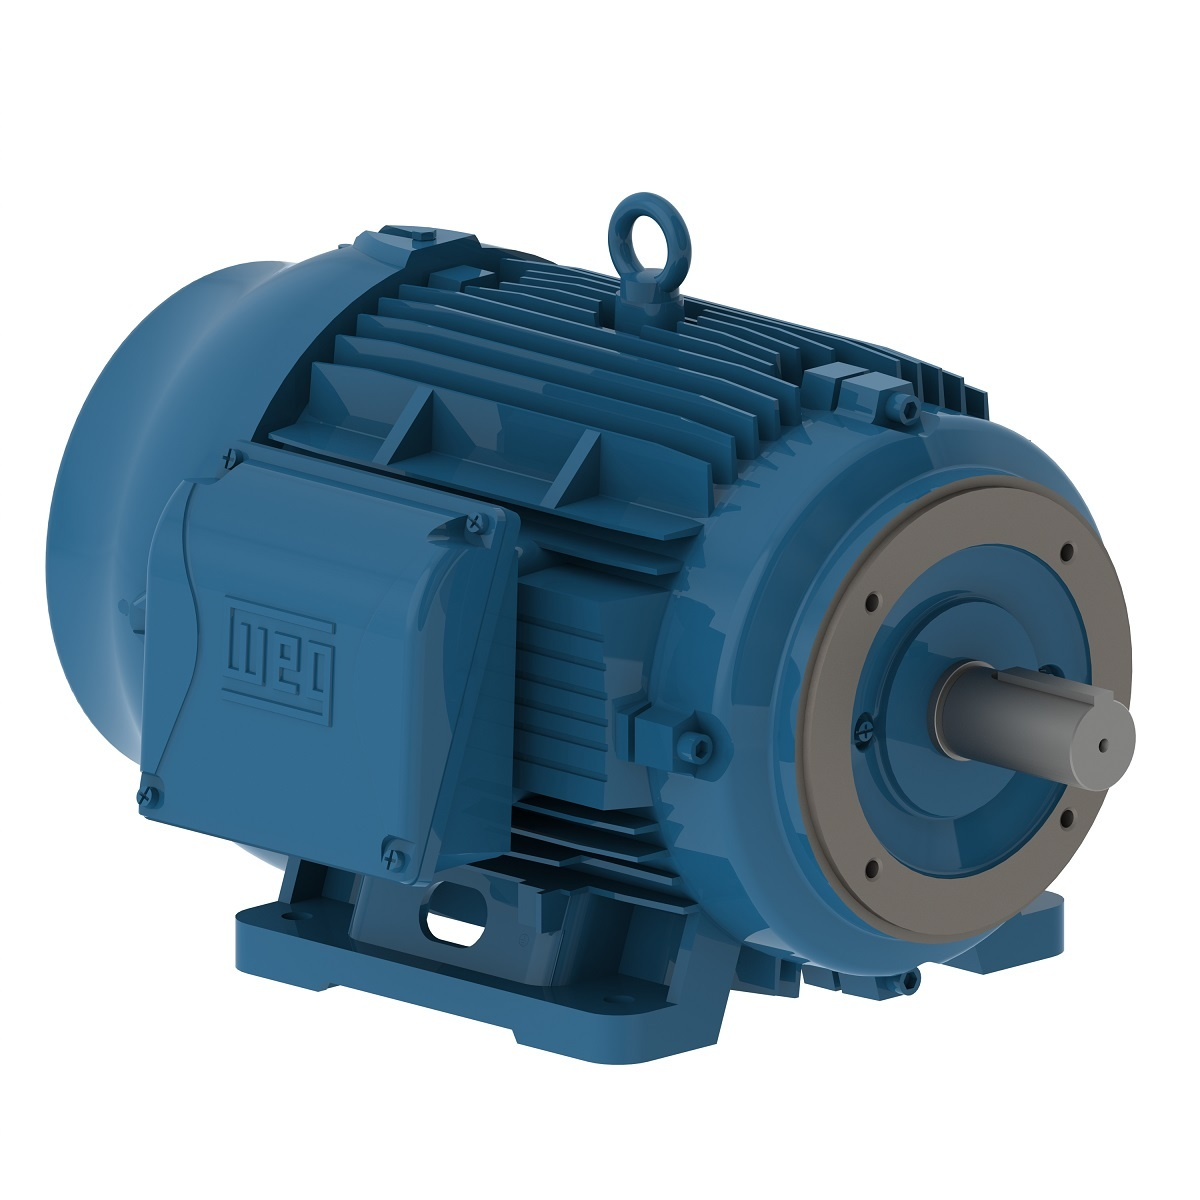 weg fire pump motor wiring diagram swift hot water system single phase best library w22 nema premium efficiency 100 hp 4p 404 5tc 3ph 208 230 460 380 v rh cc029a great installation